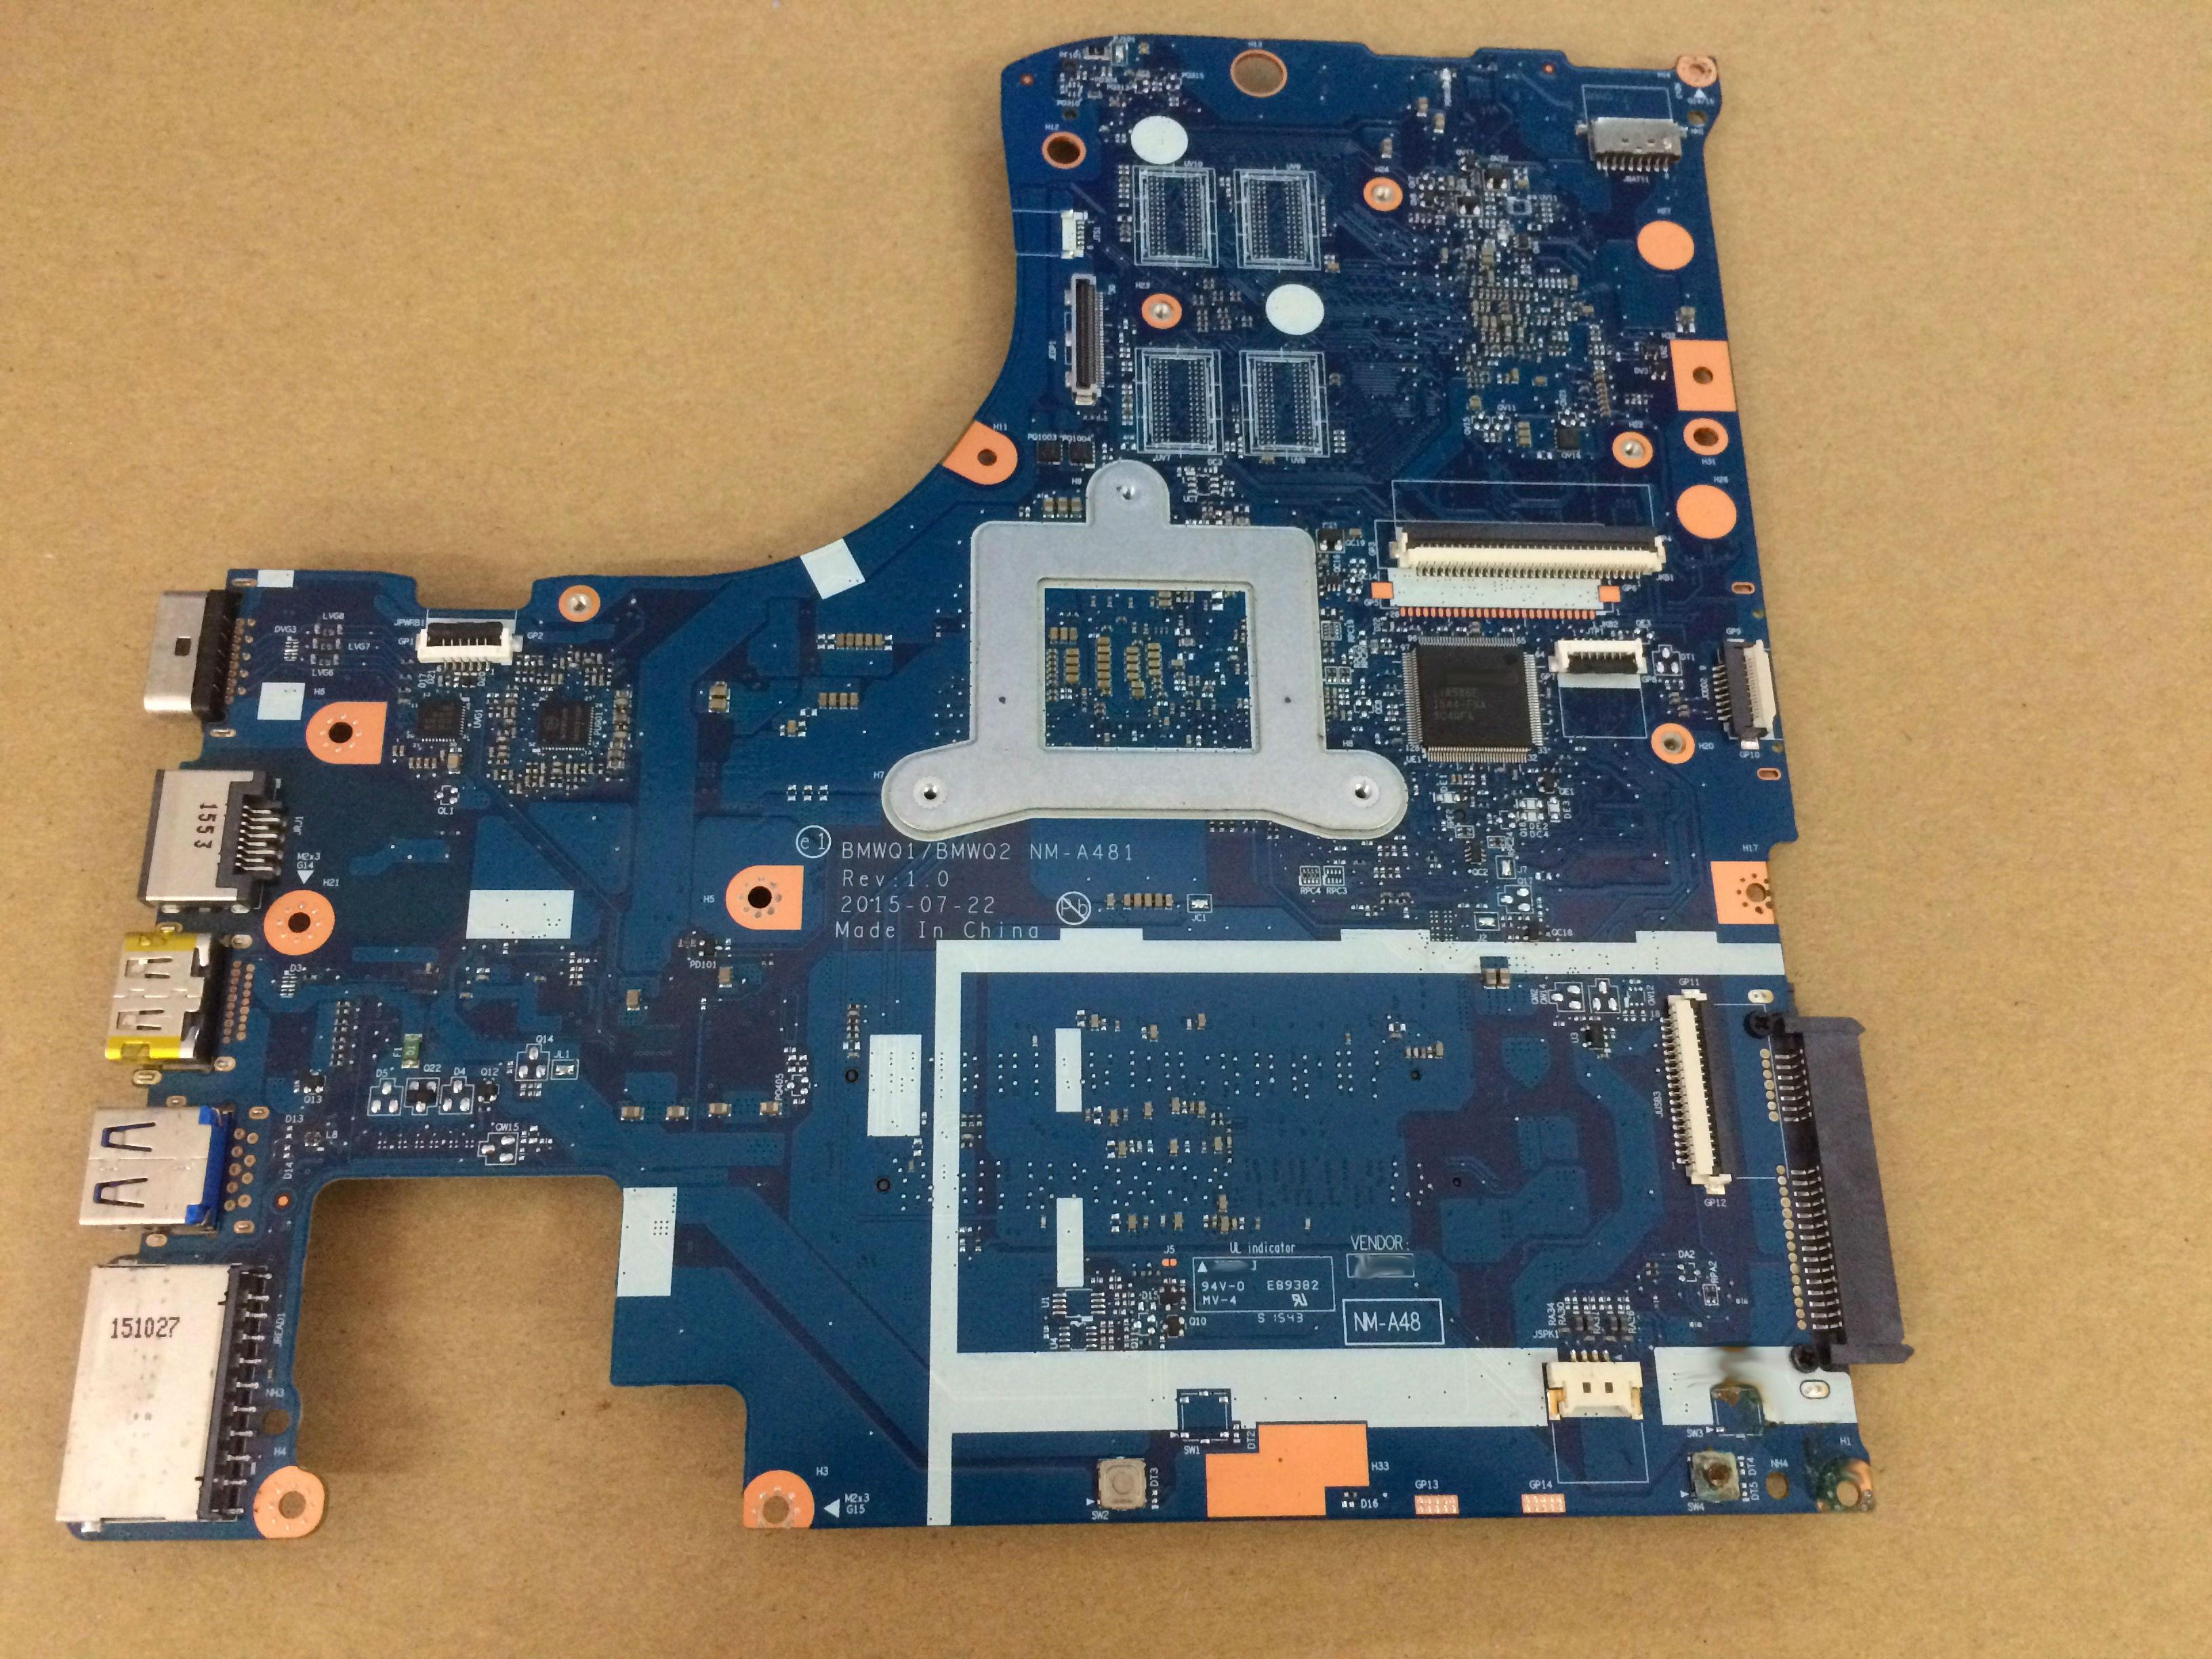 For Lenovo IdeaPad 300-15ISK Laptop motherboard 5B20K38221 BMWQ1 BMWQ2 NM-A481 mainboard I3 6100U cpu